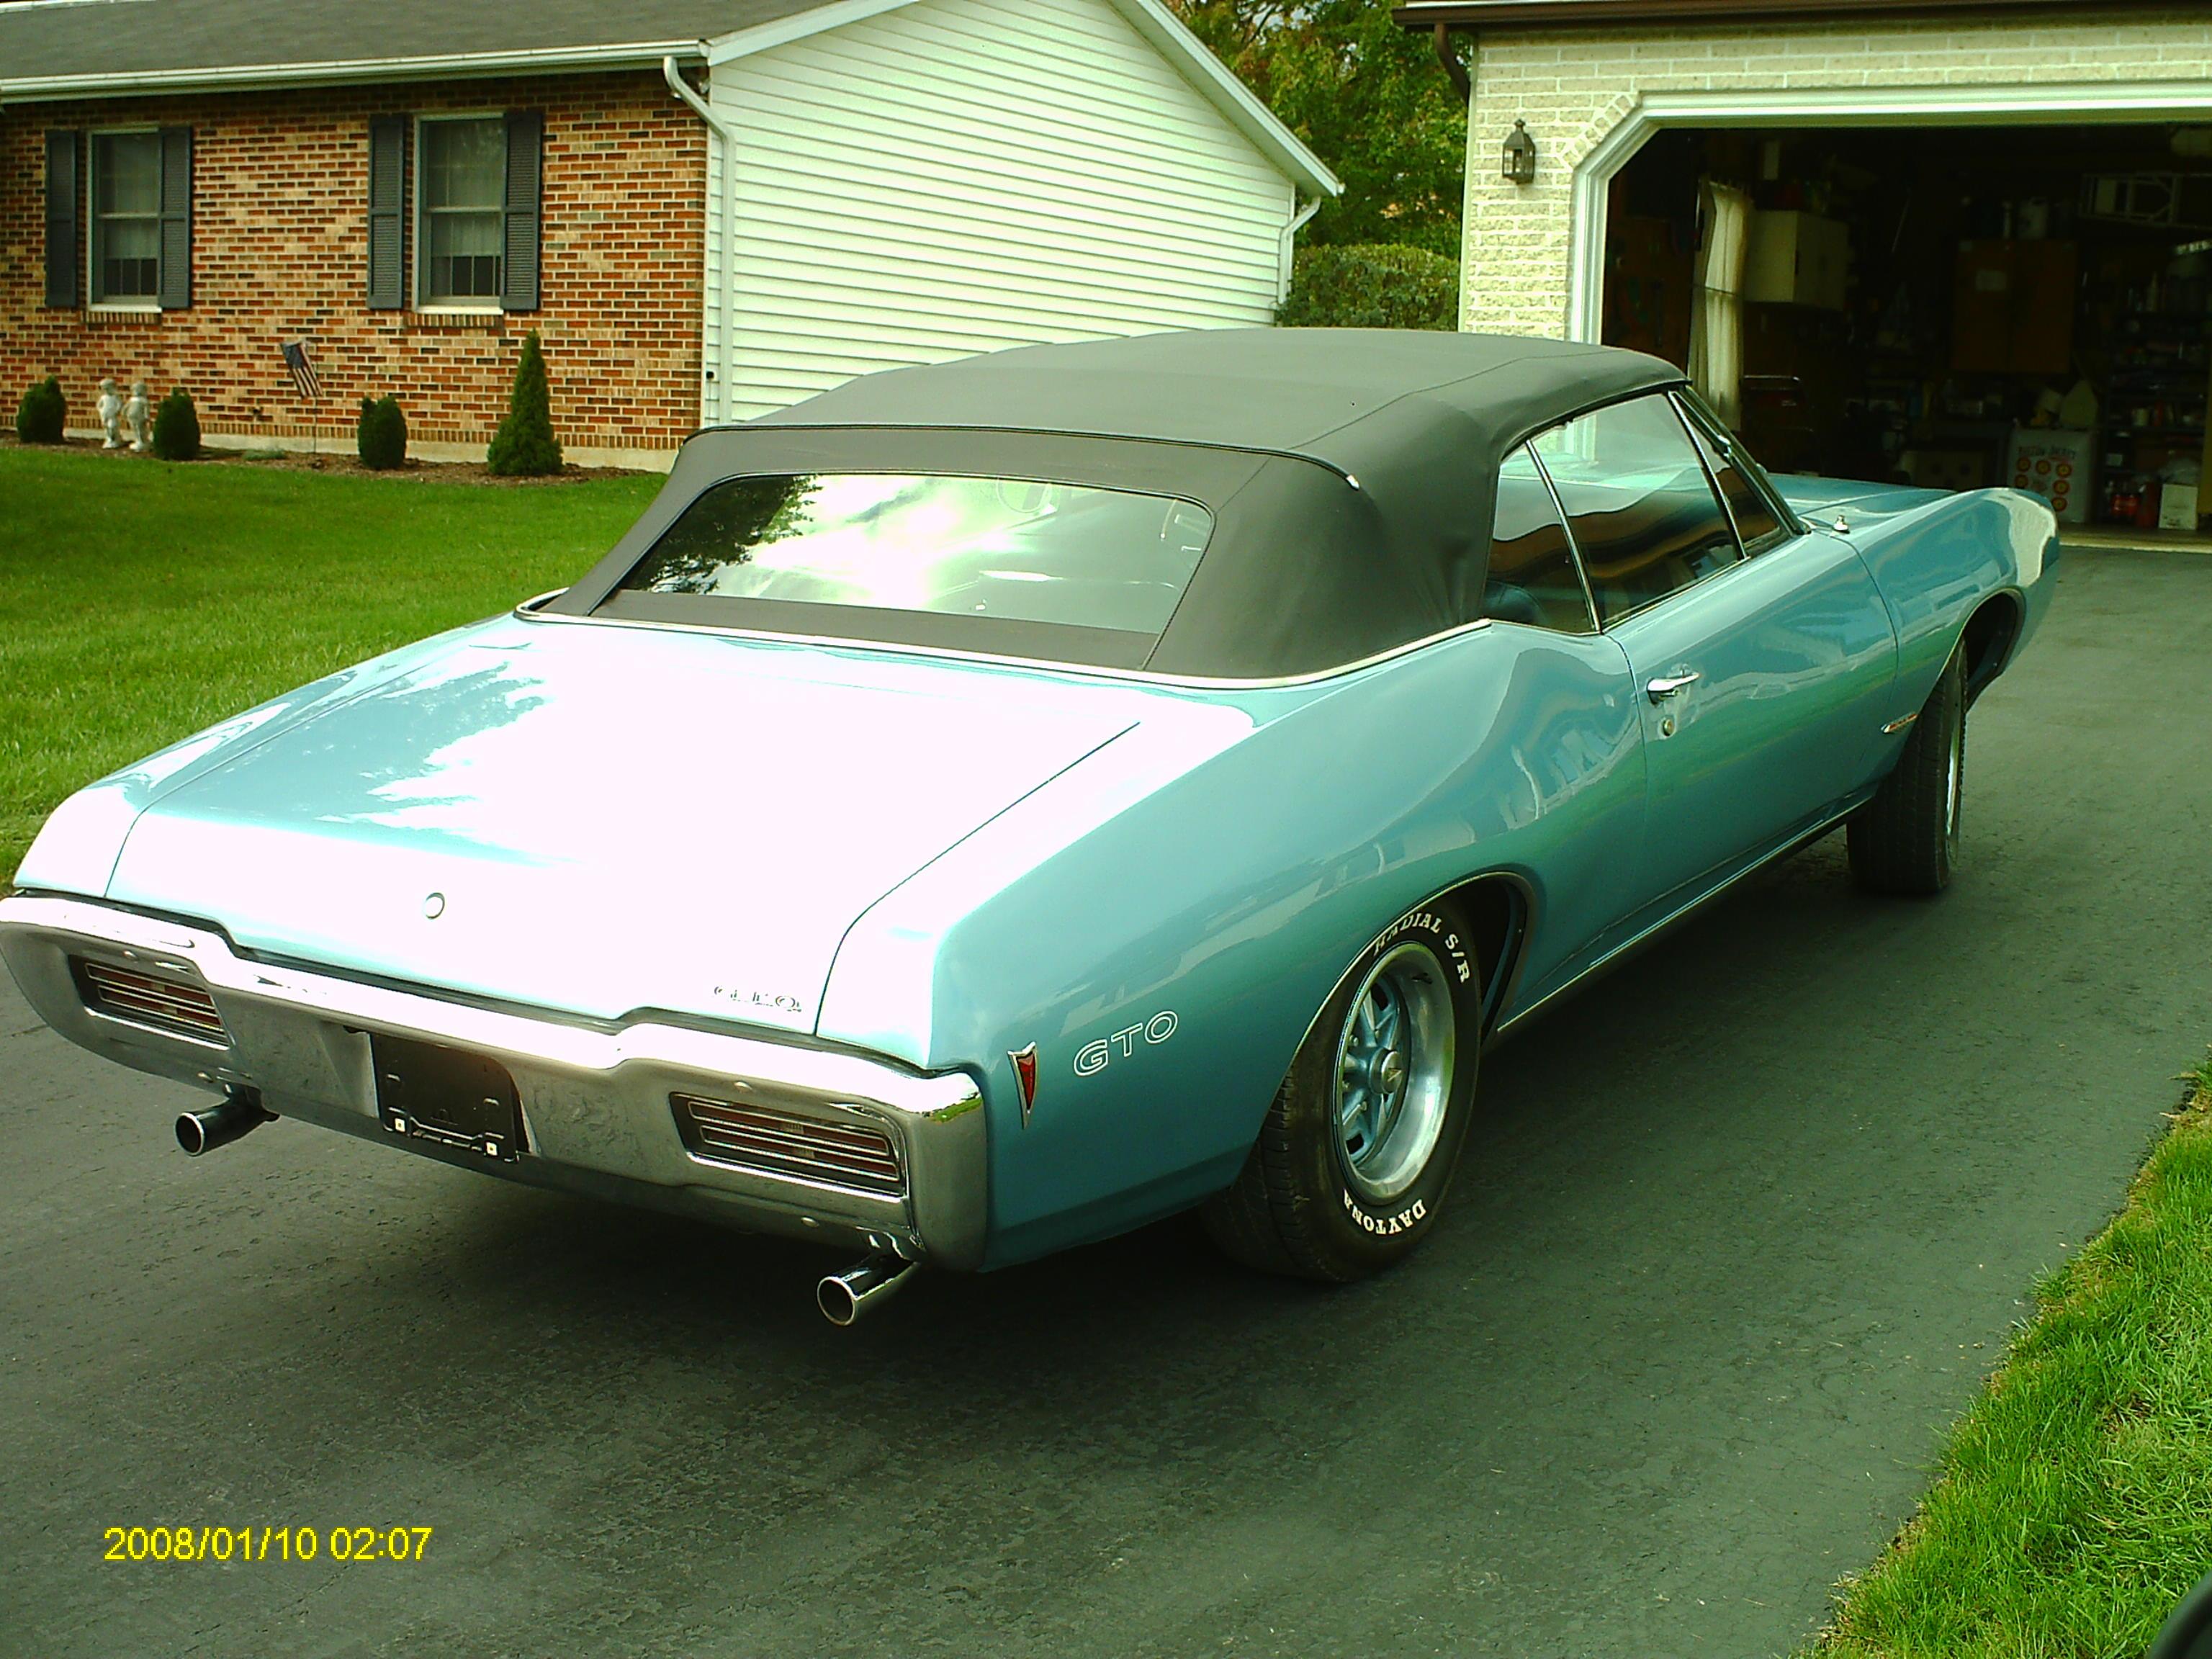 Fully Restored 1968 Pontiac GTO Convertible-1968-gto-convertible003.jpg